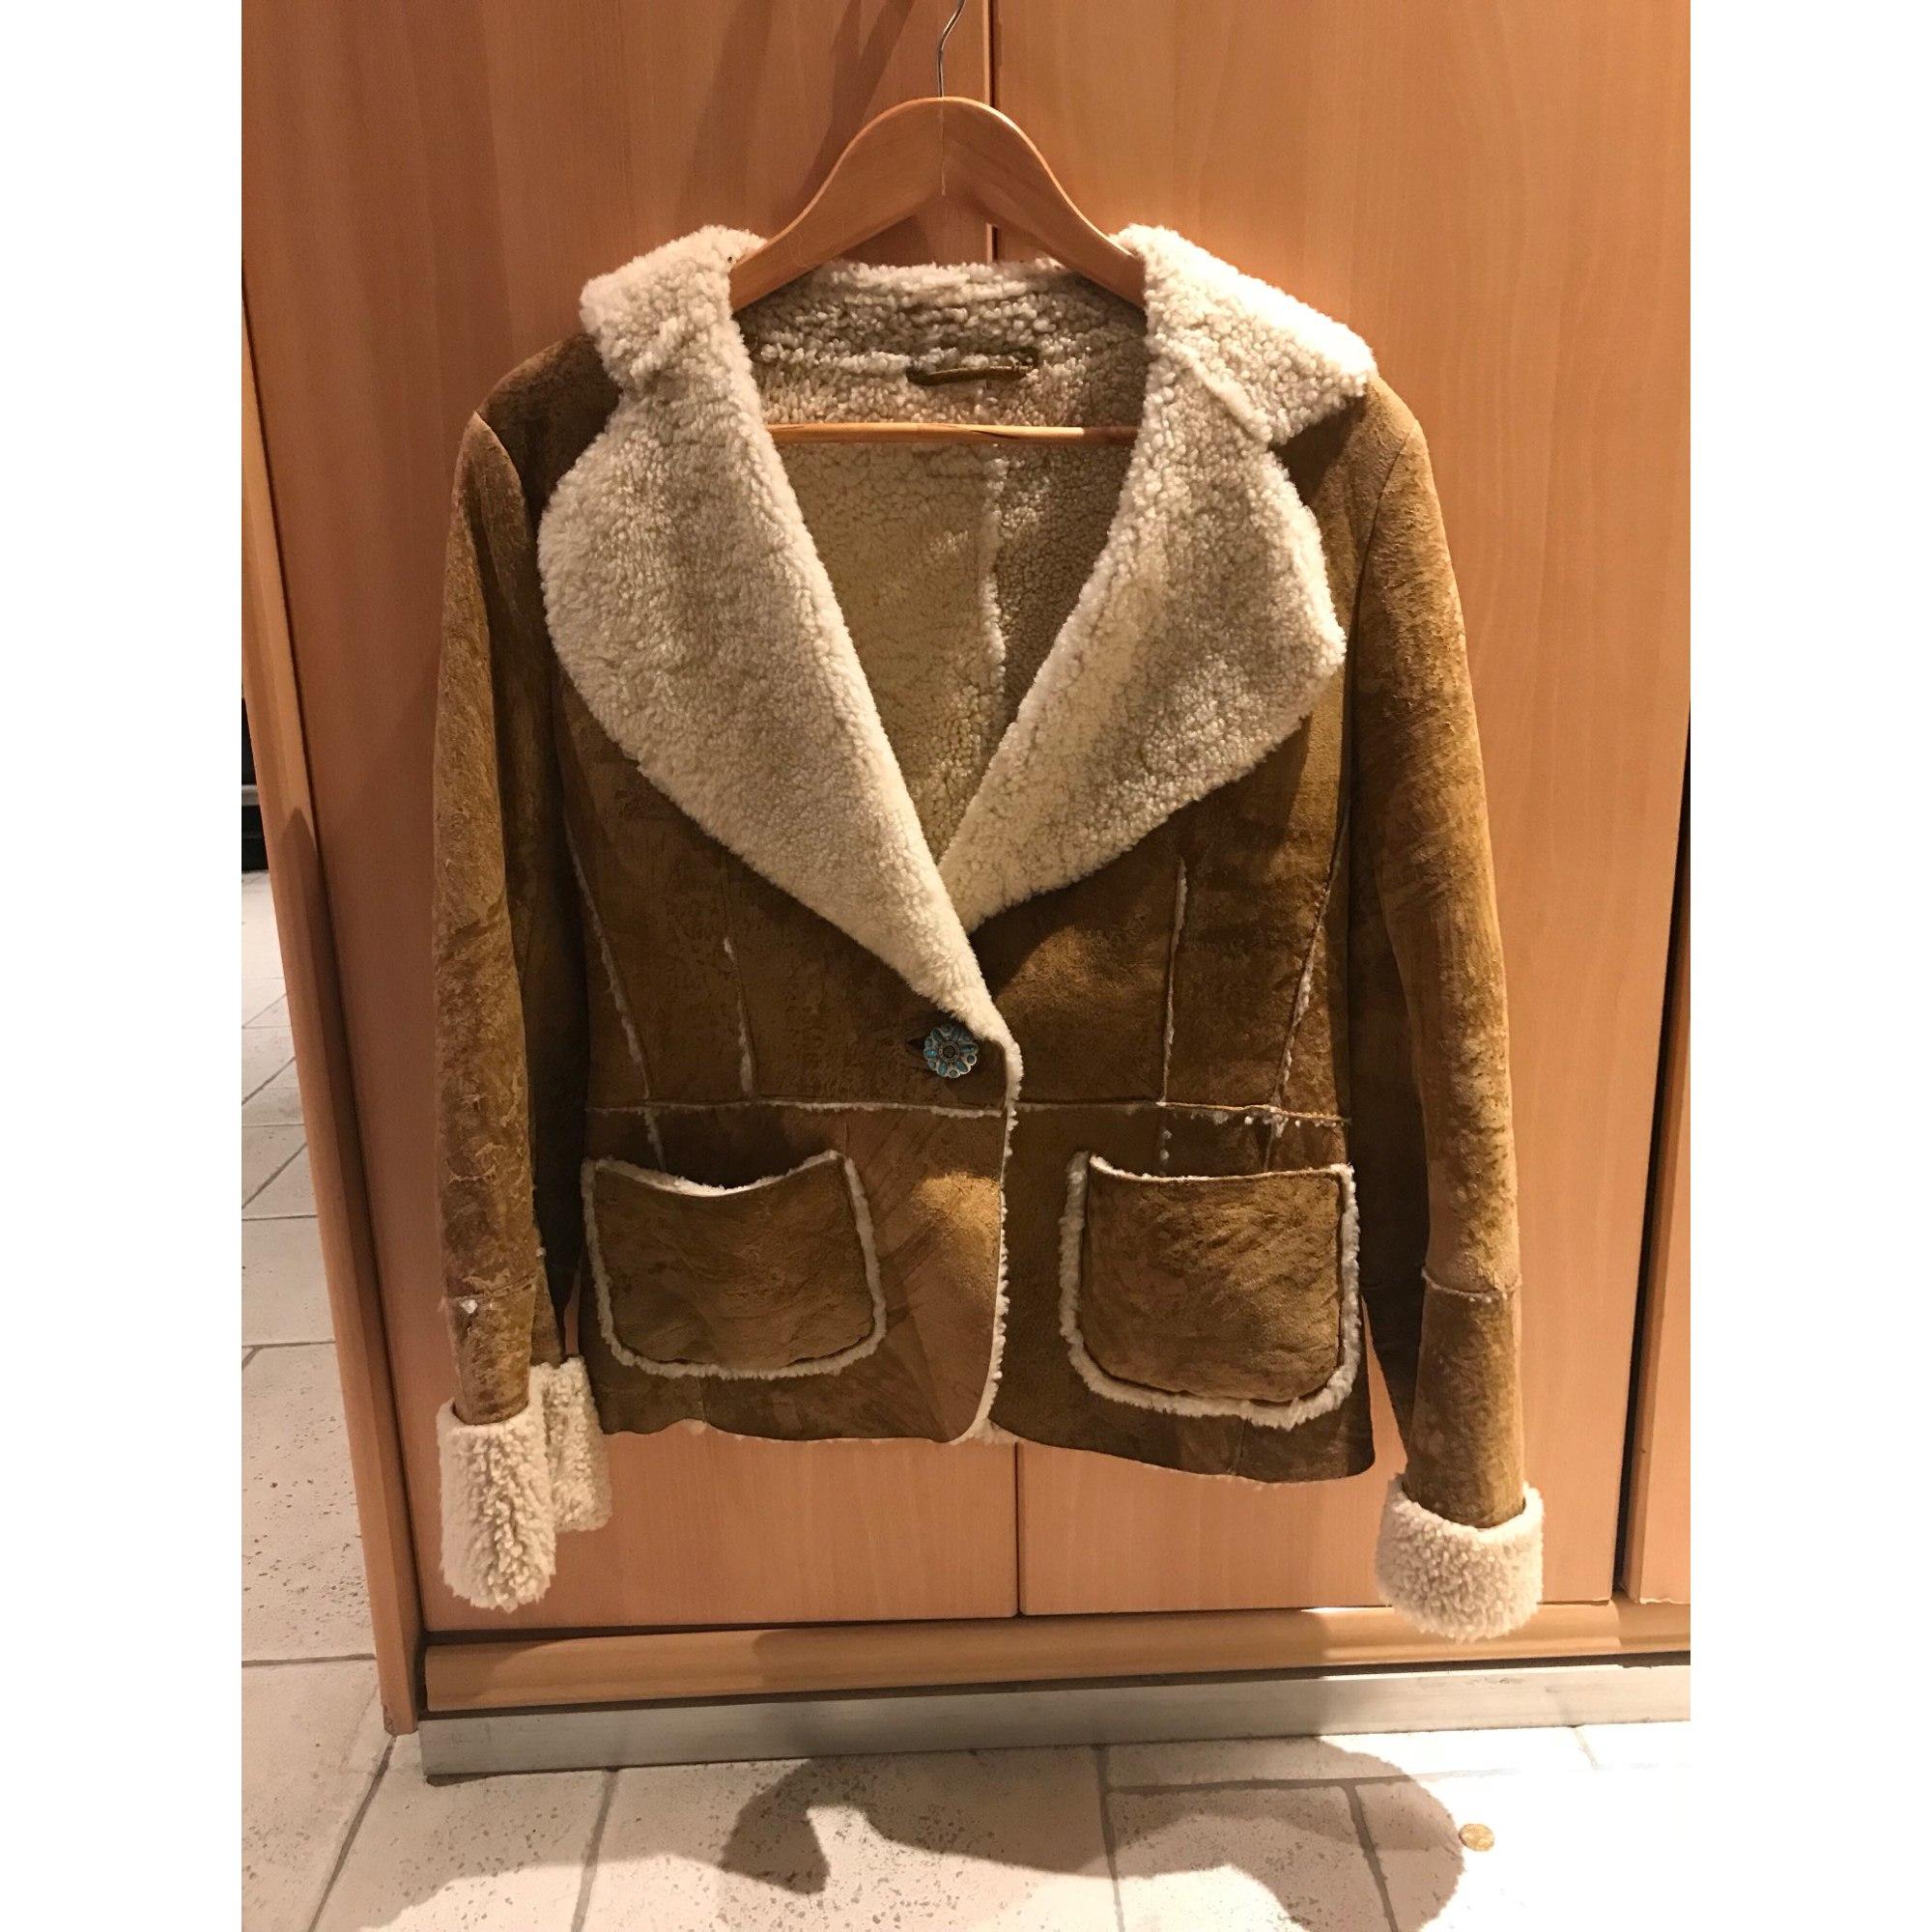 Manteau en cuir MARLBORO CLASSICS Beige, camel